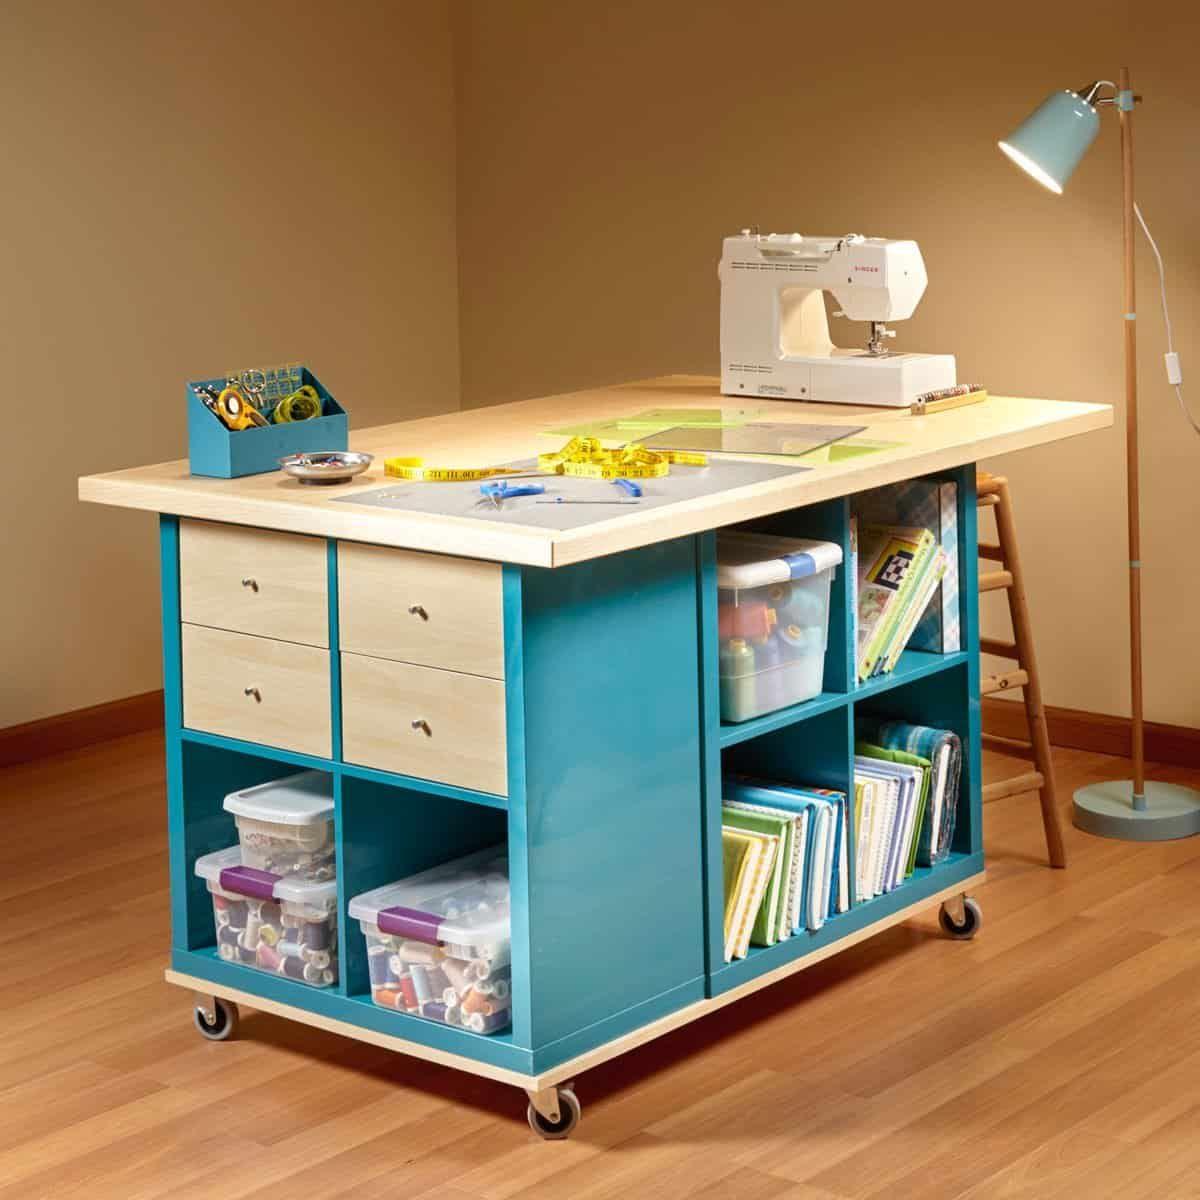 artist work table with storage